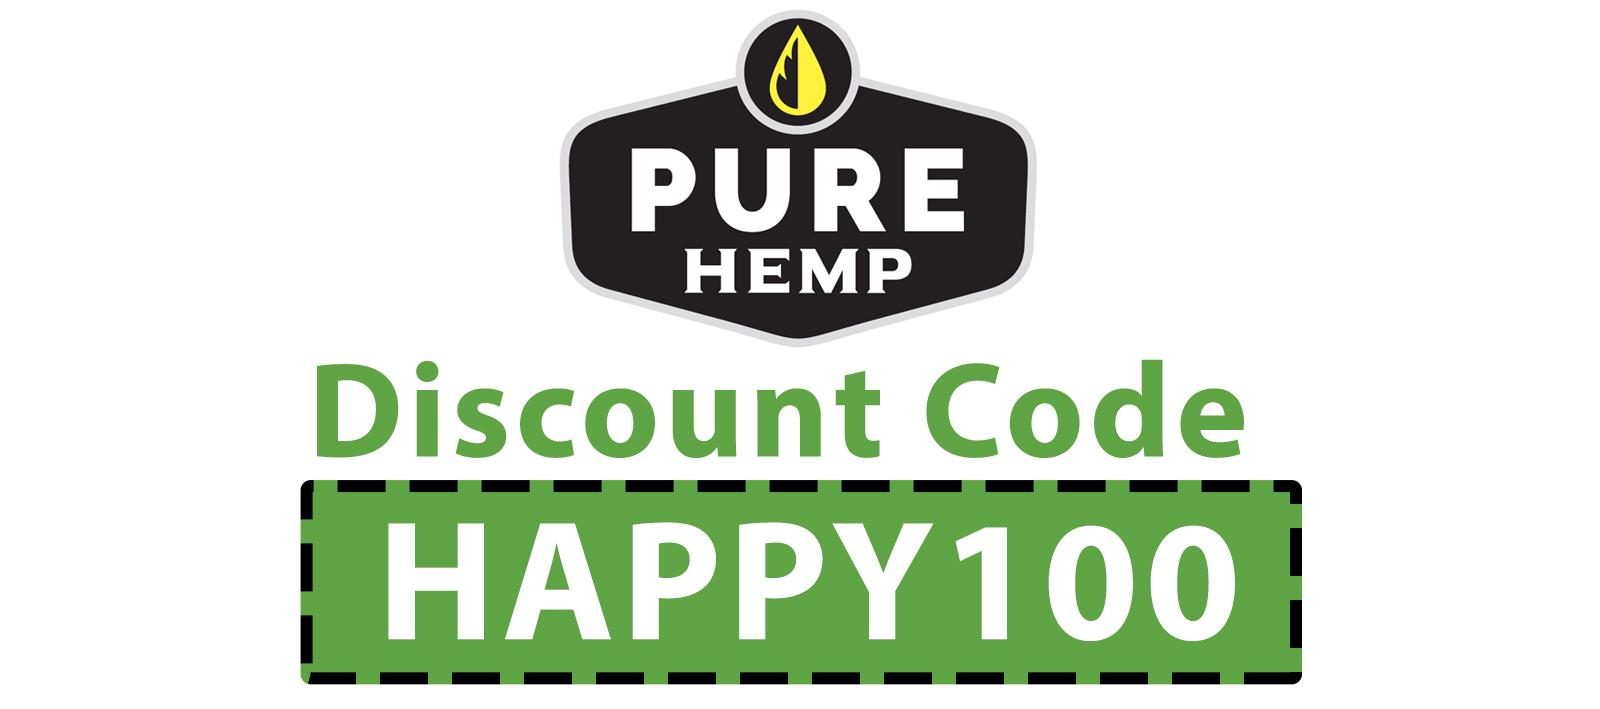 Pure Hemp CBD Discount Code: HAPPY100